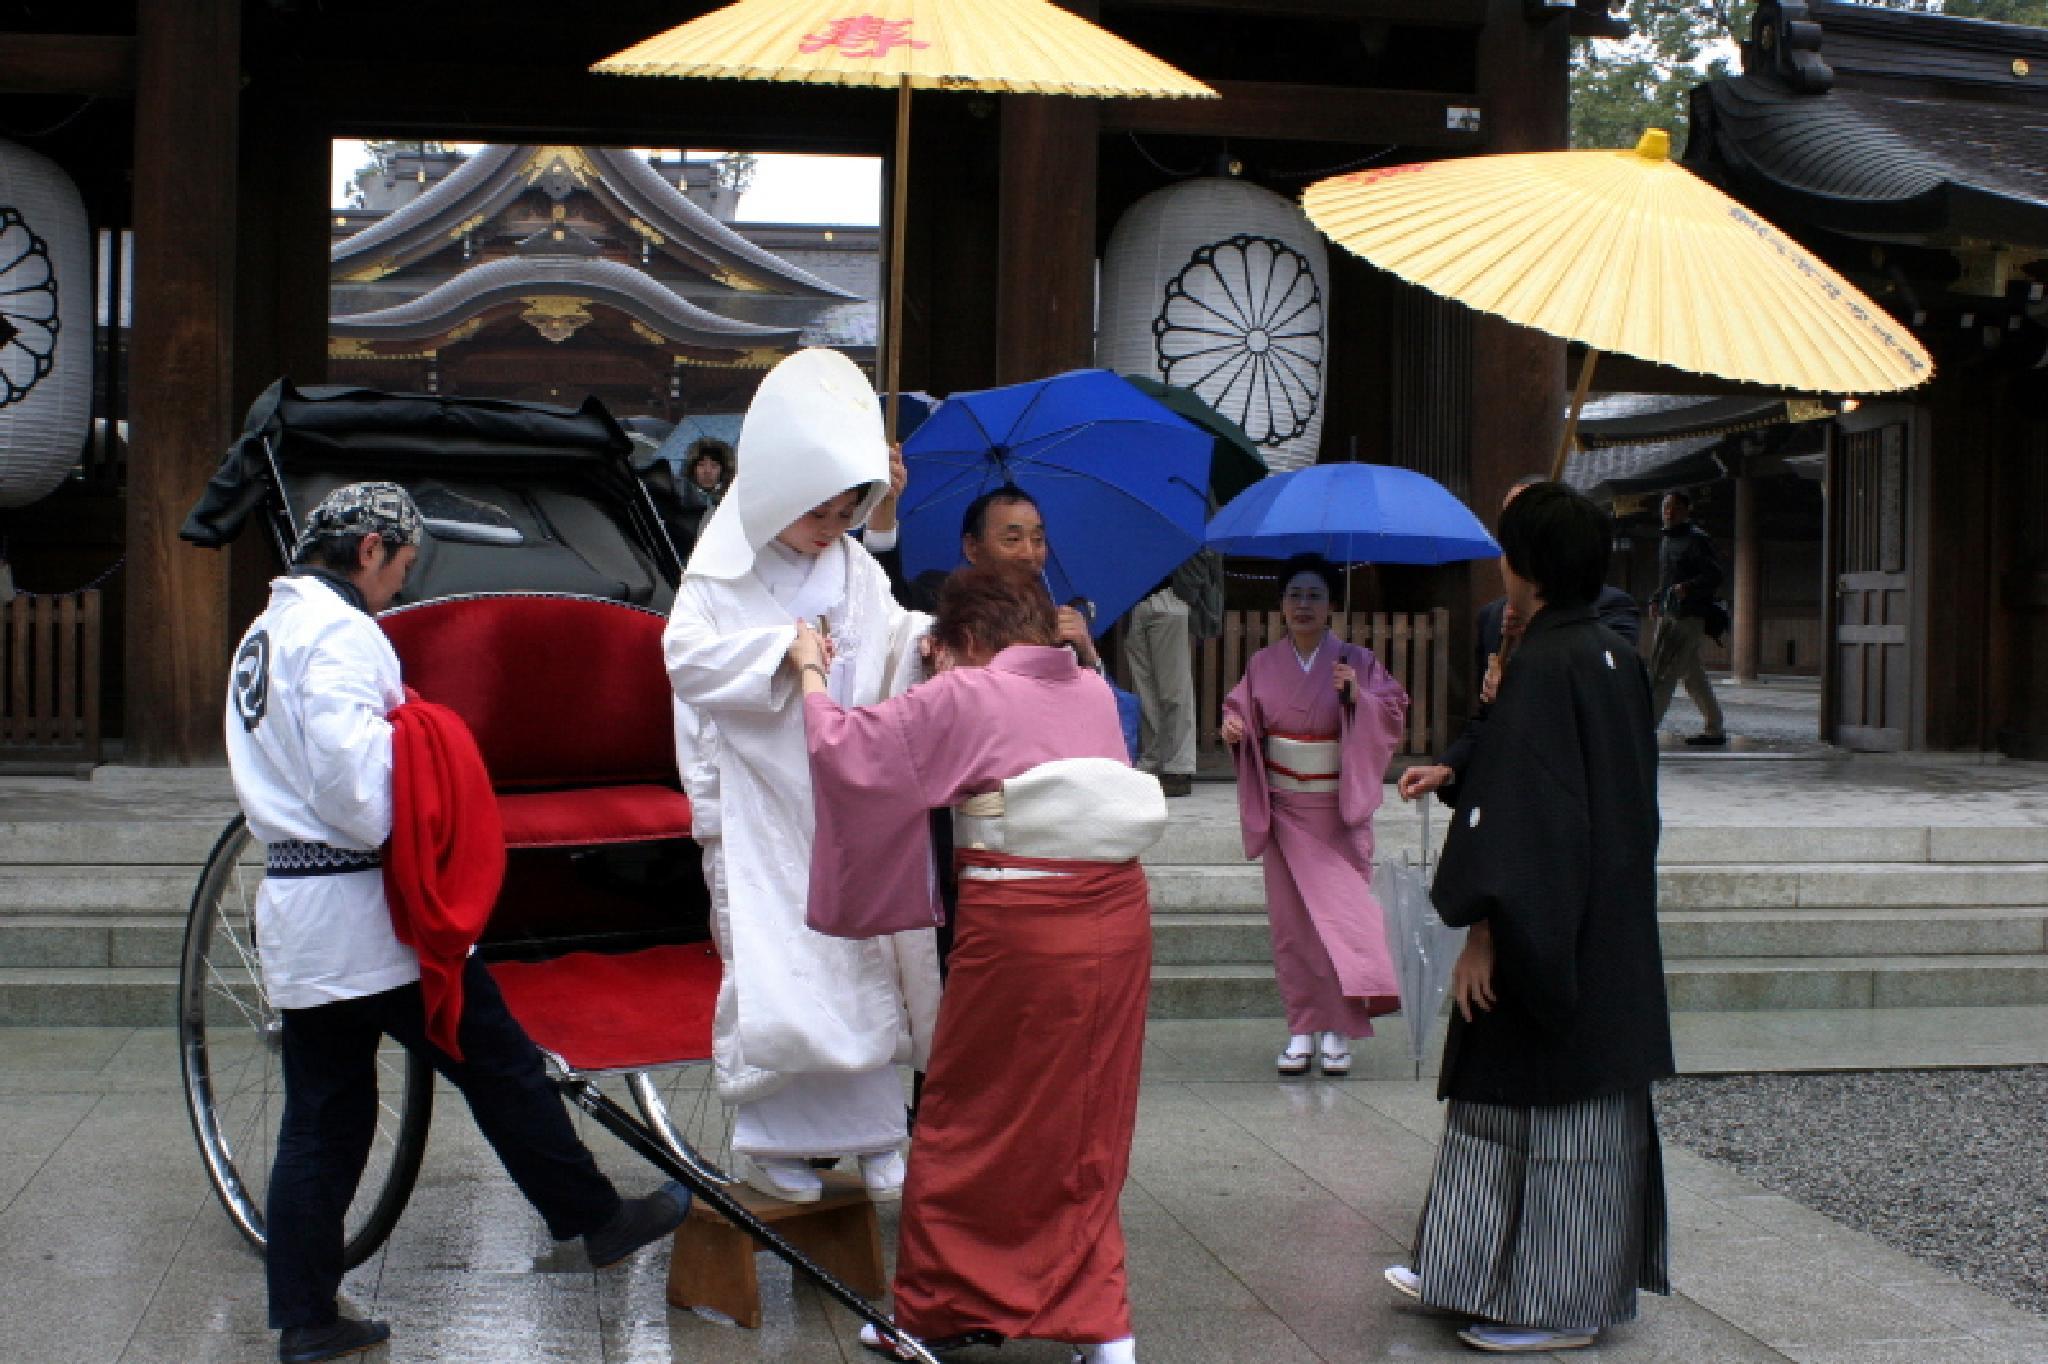 Wedding on a rainy day by photoeene